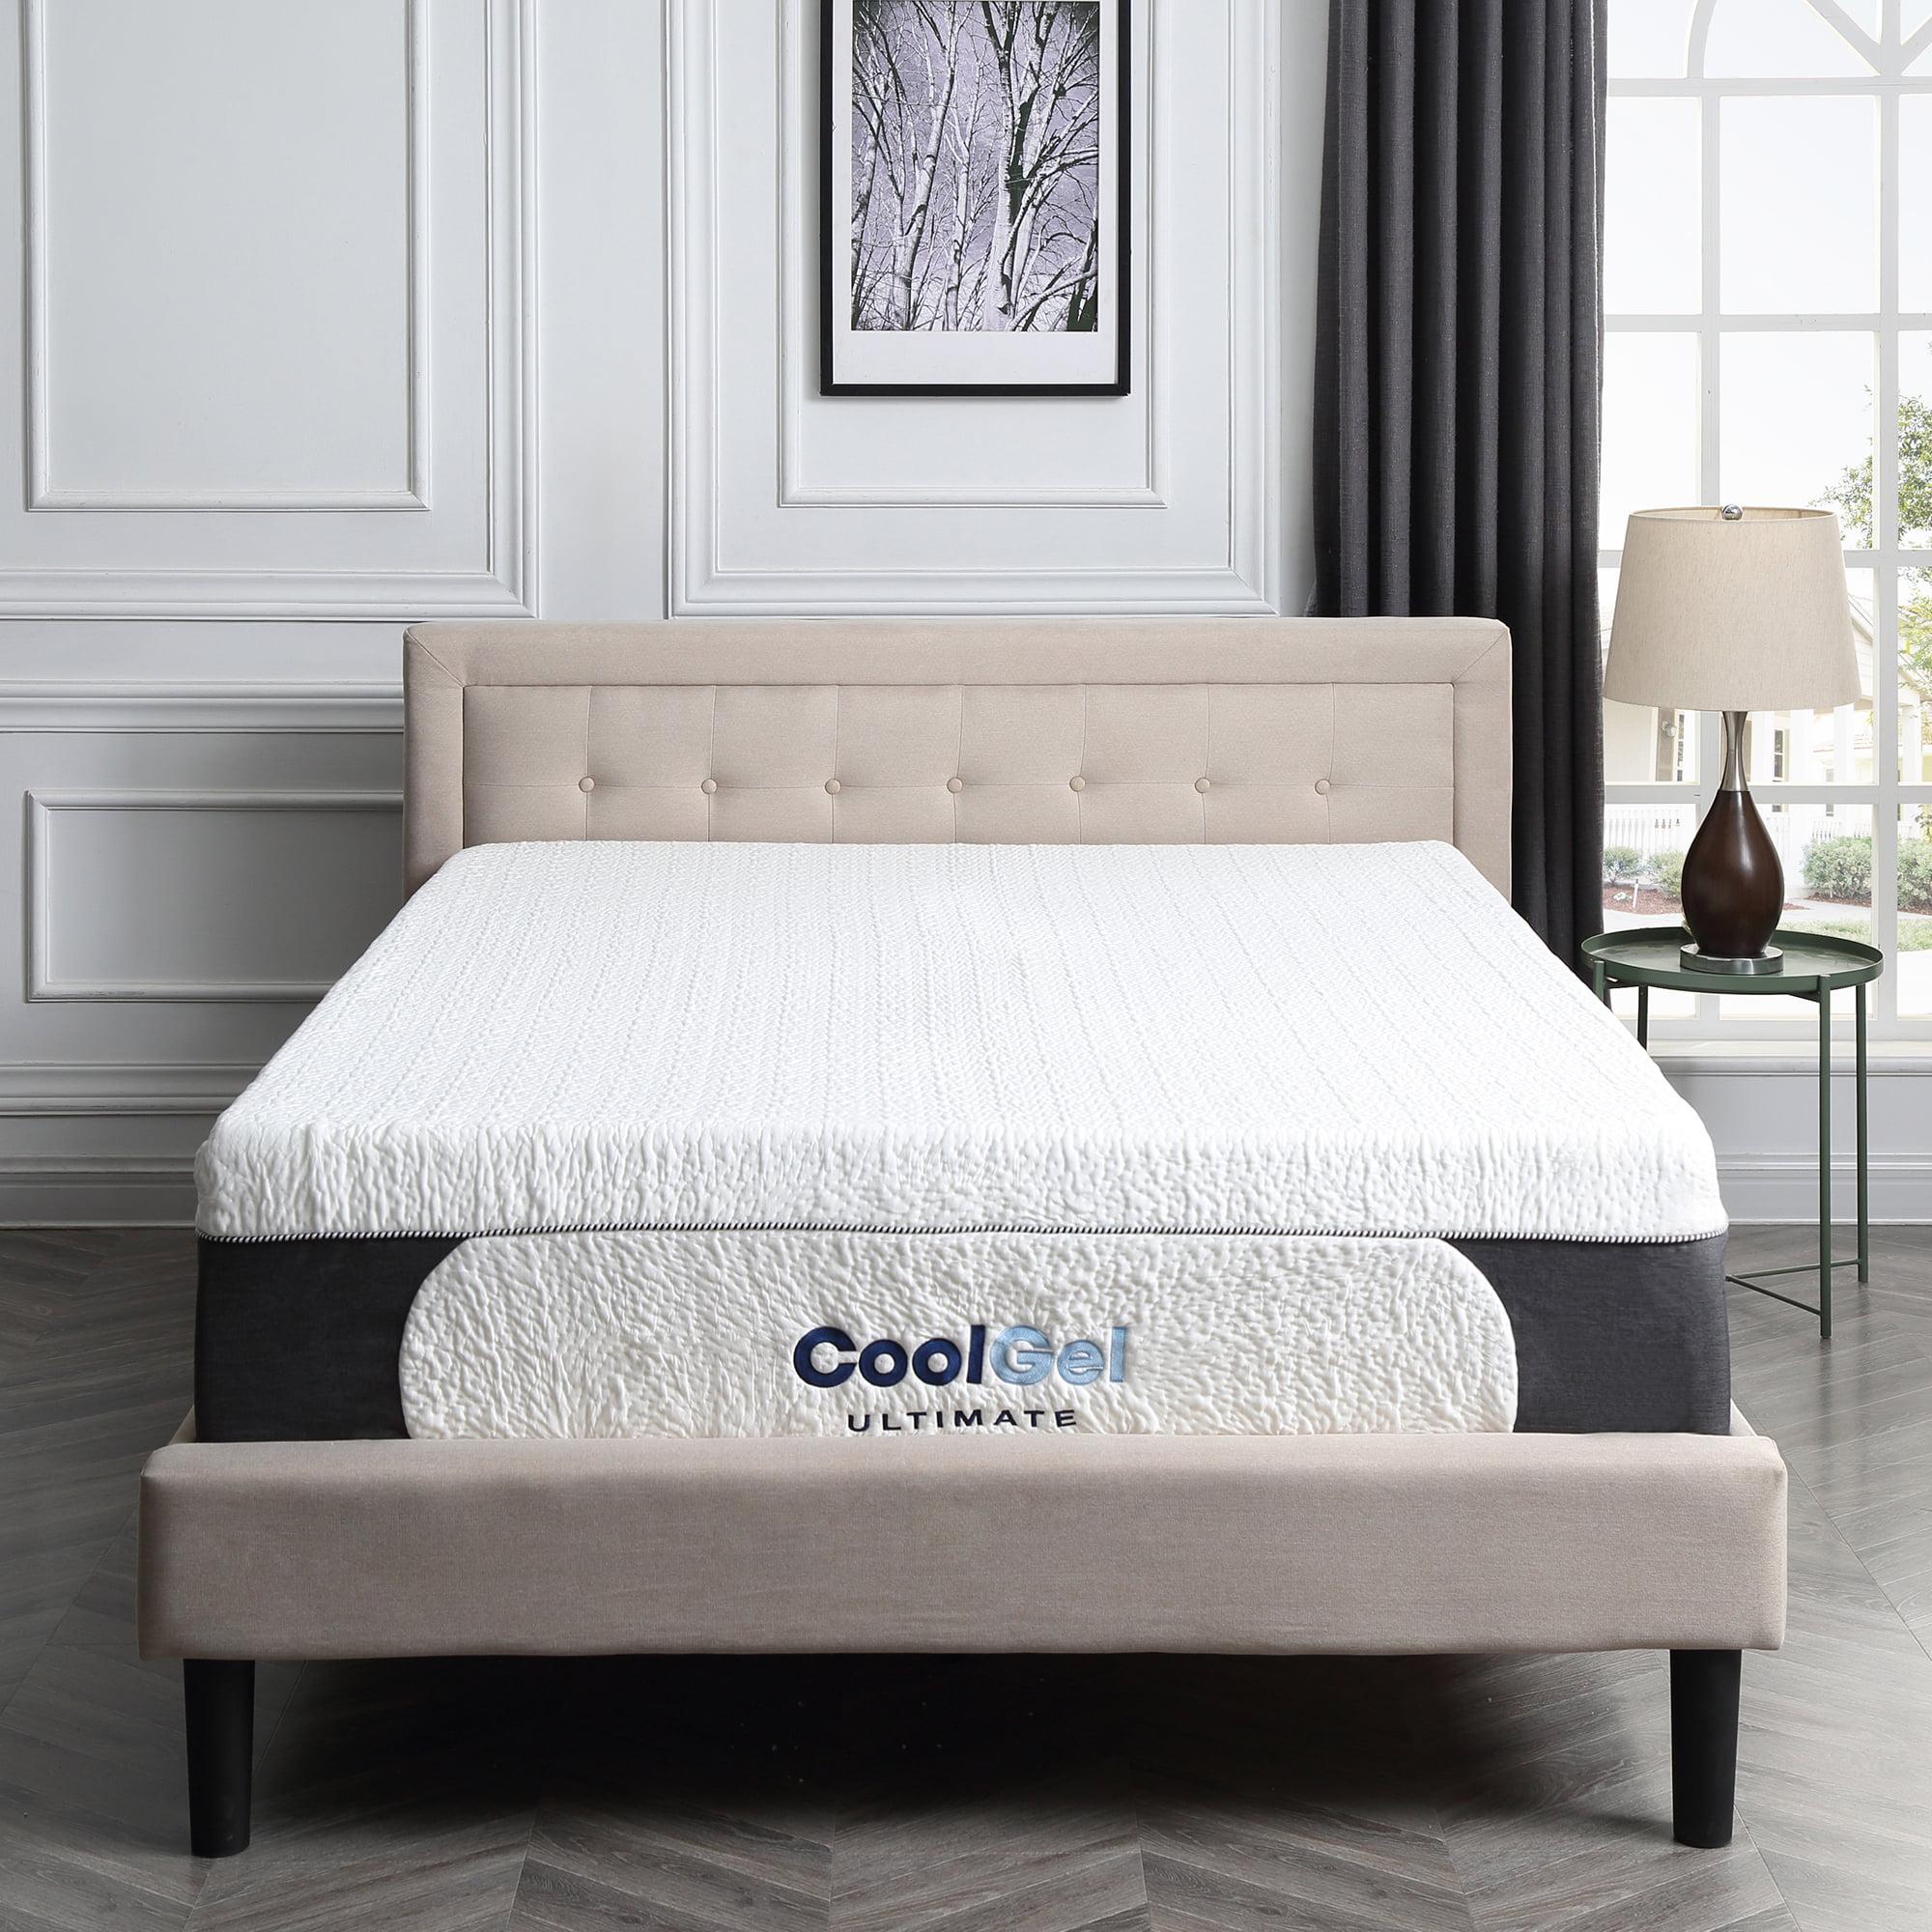 Modern Sleep Cool Gel Ultimate Gel Memory Foam 14 Inch Mattress With